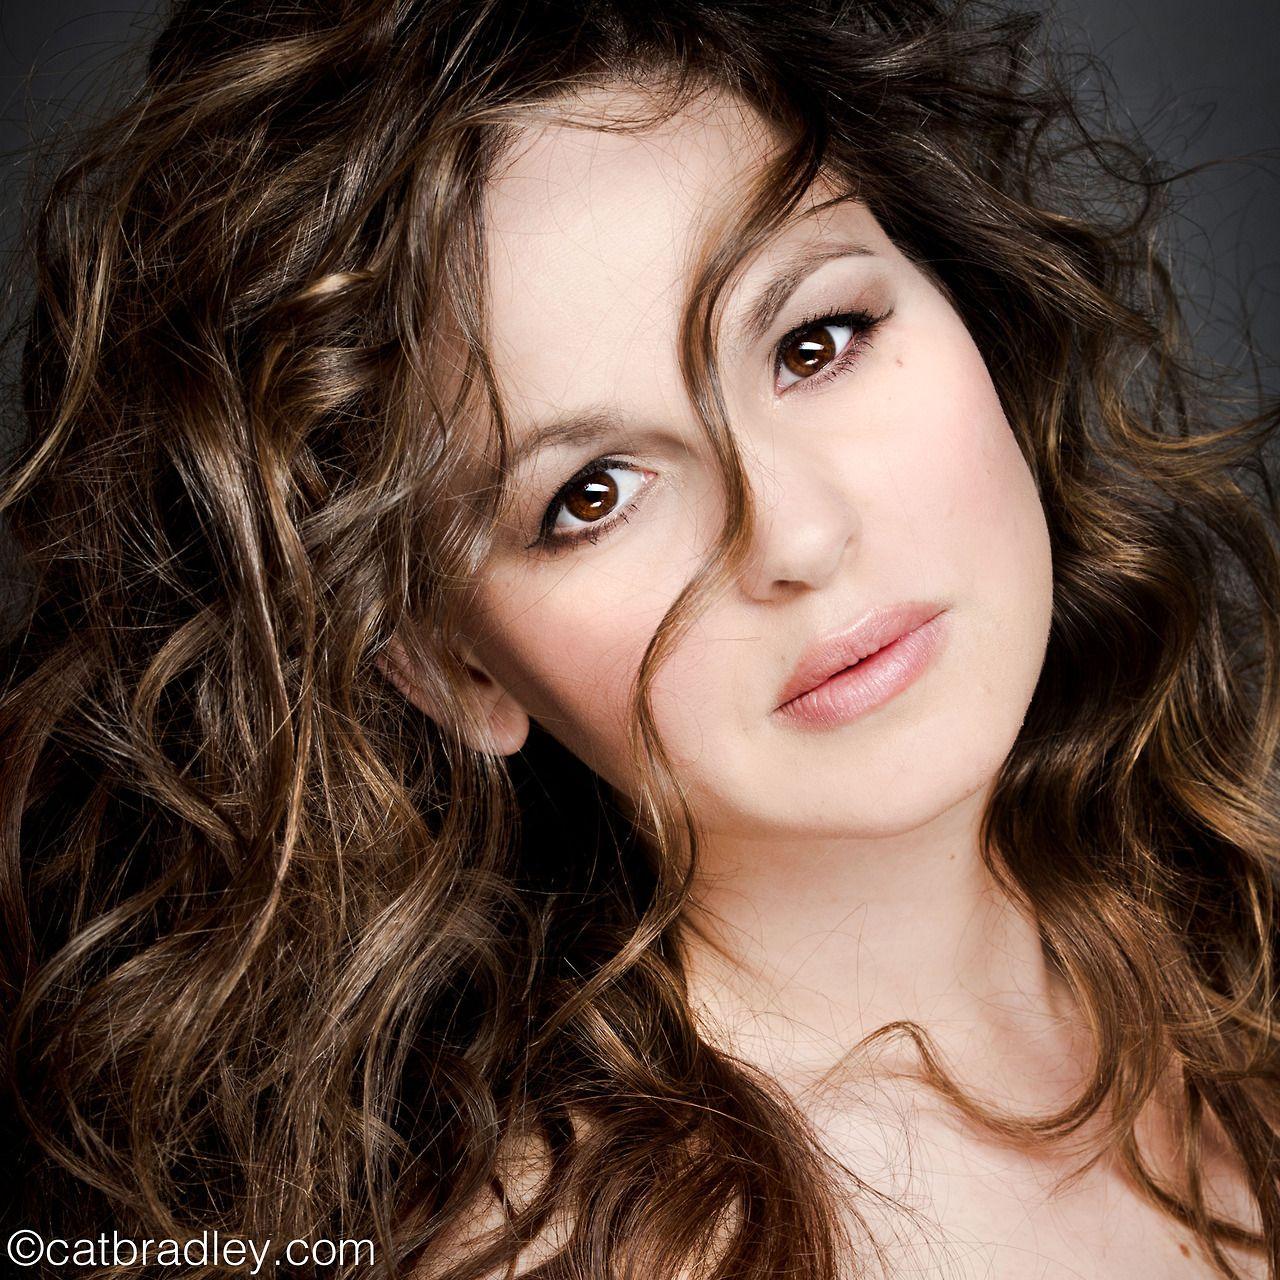 Giovanna Fletcher, wife of Tom Fletcher (McFly), author of